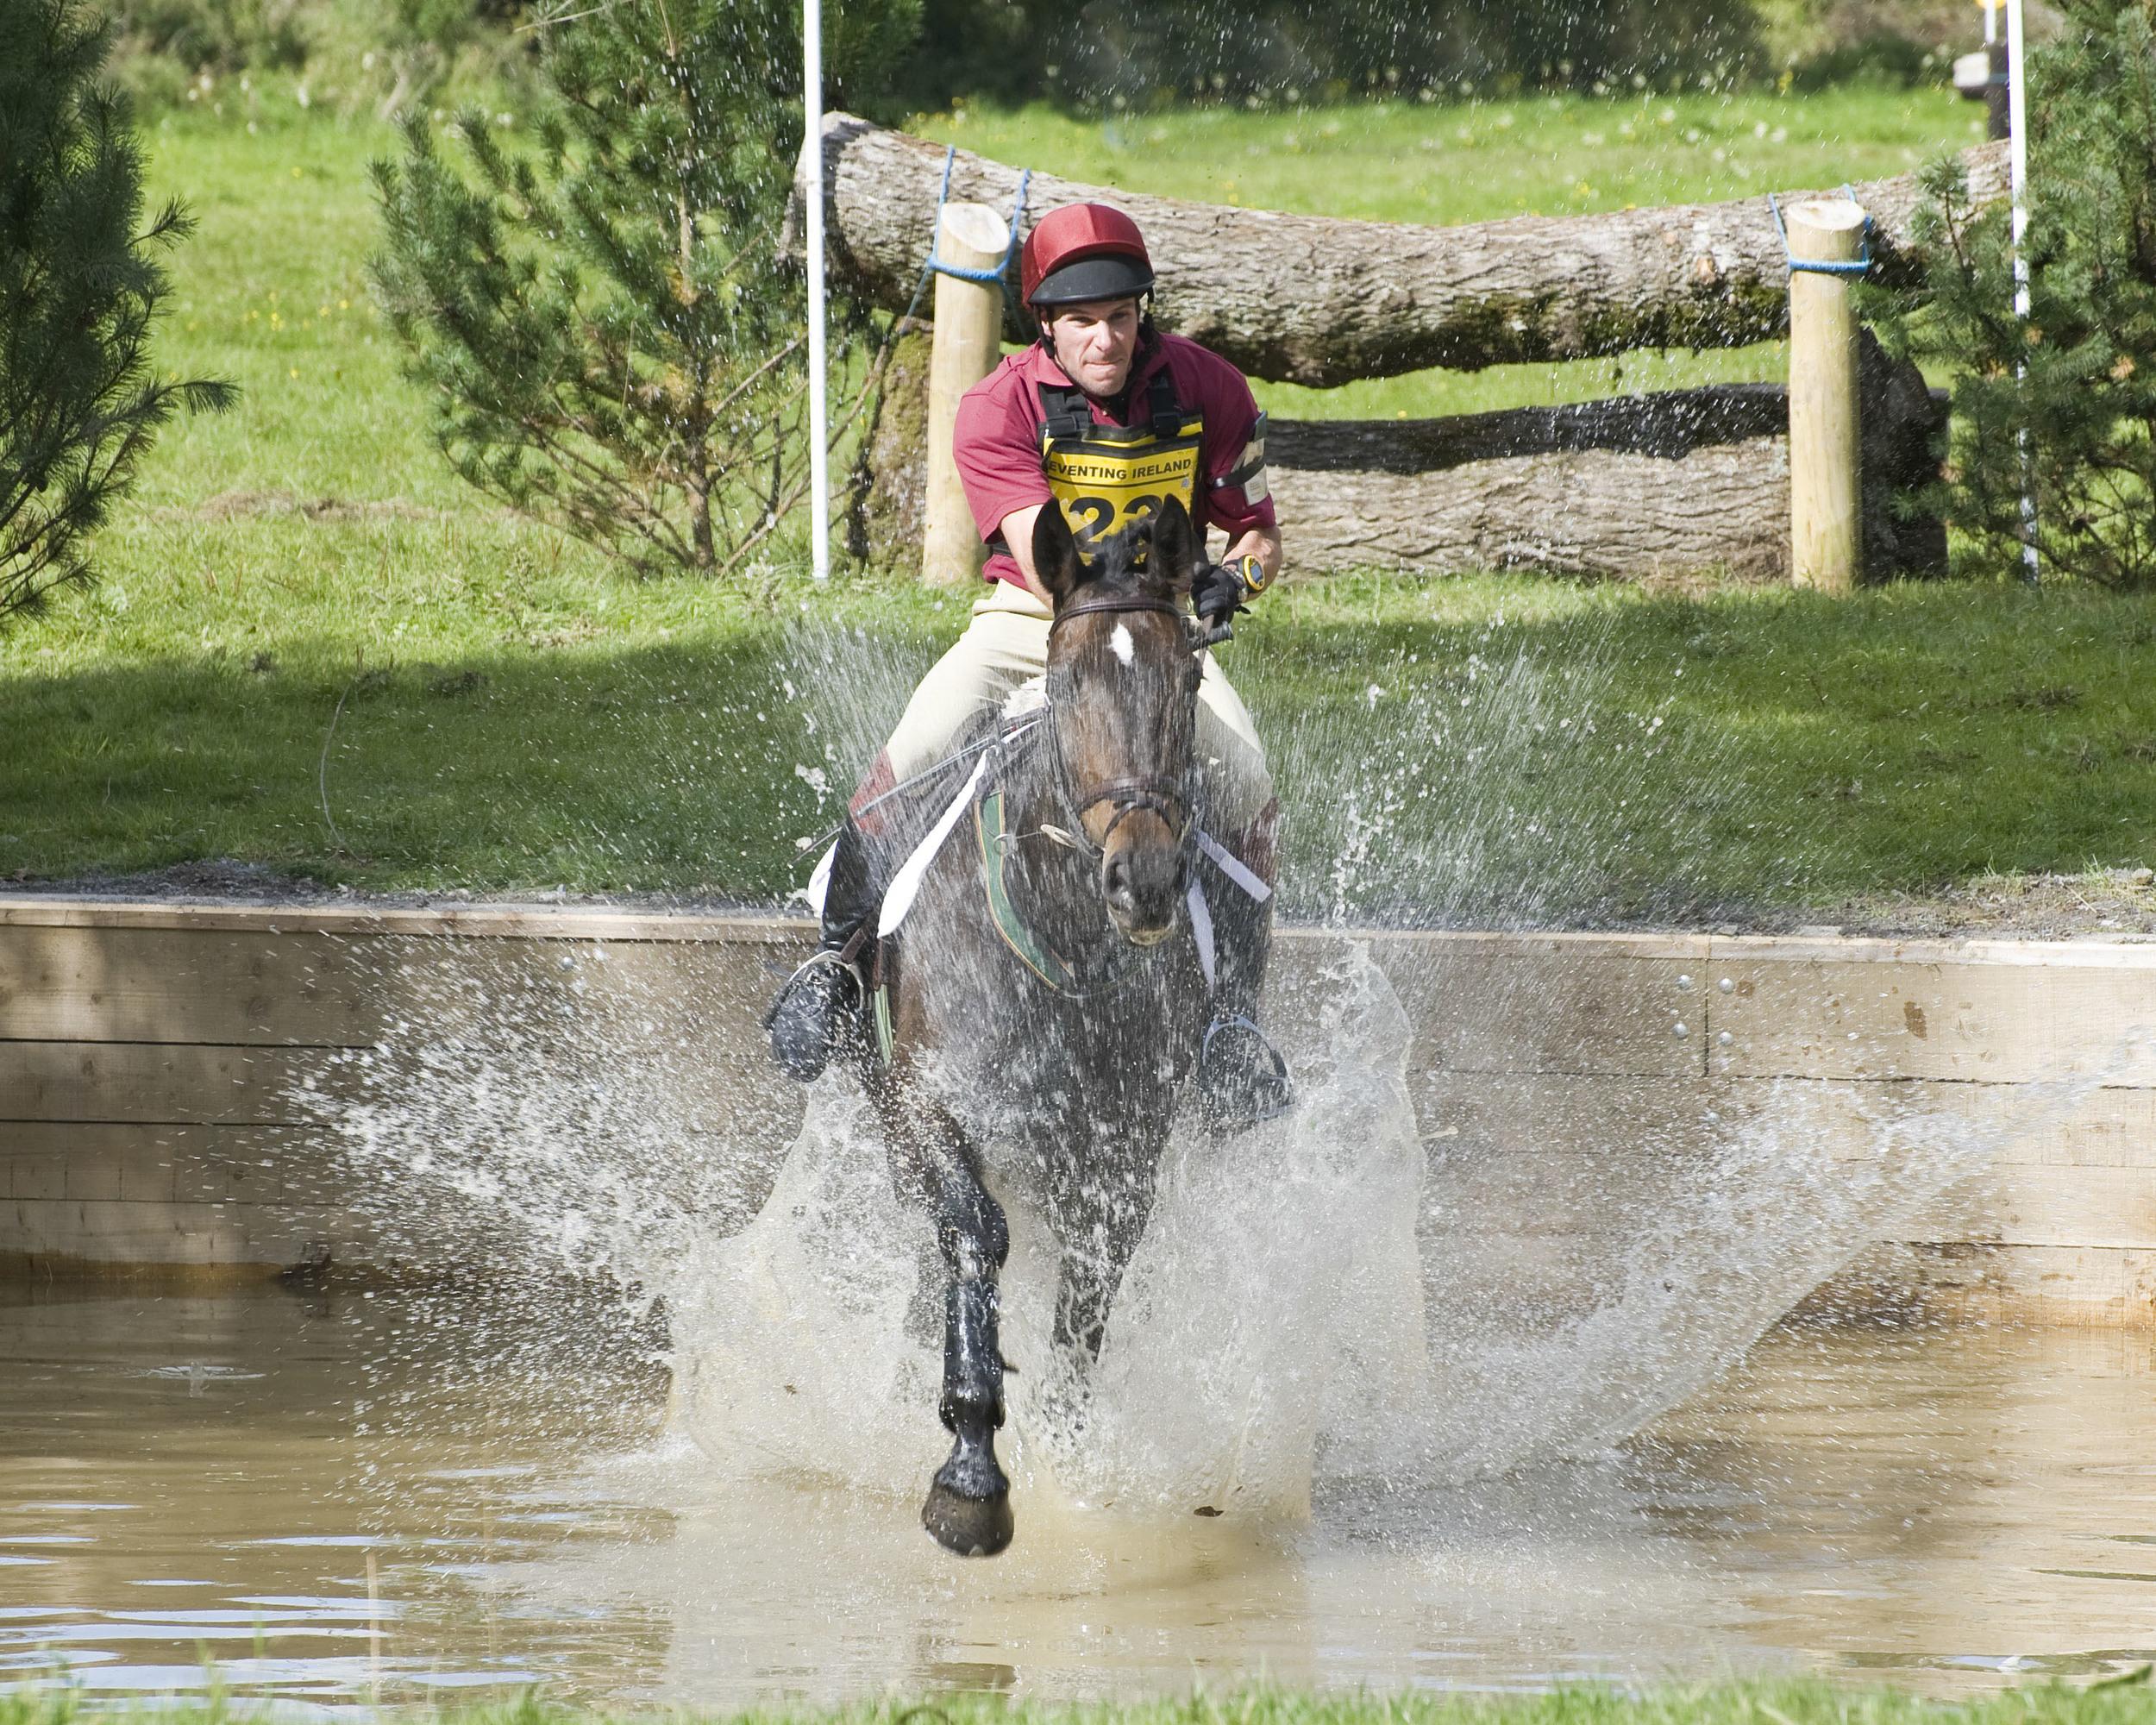 Splash-jpg-2-Grove-Horse-Trials.jpg